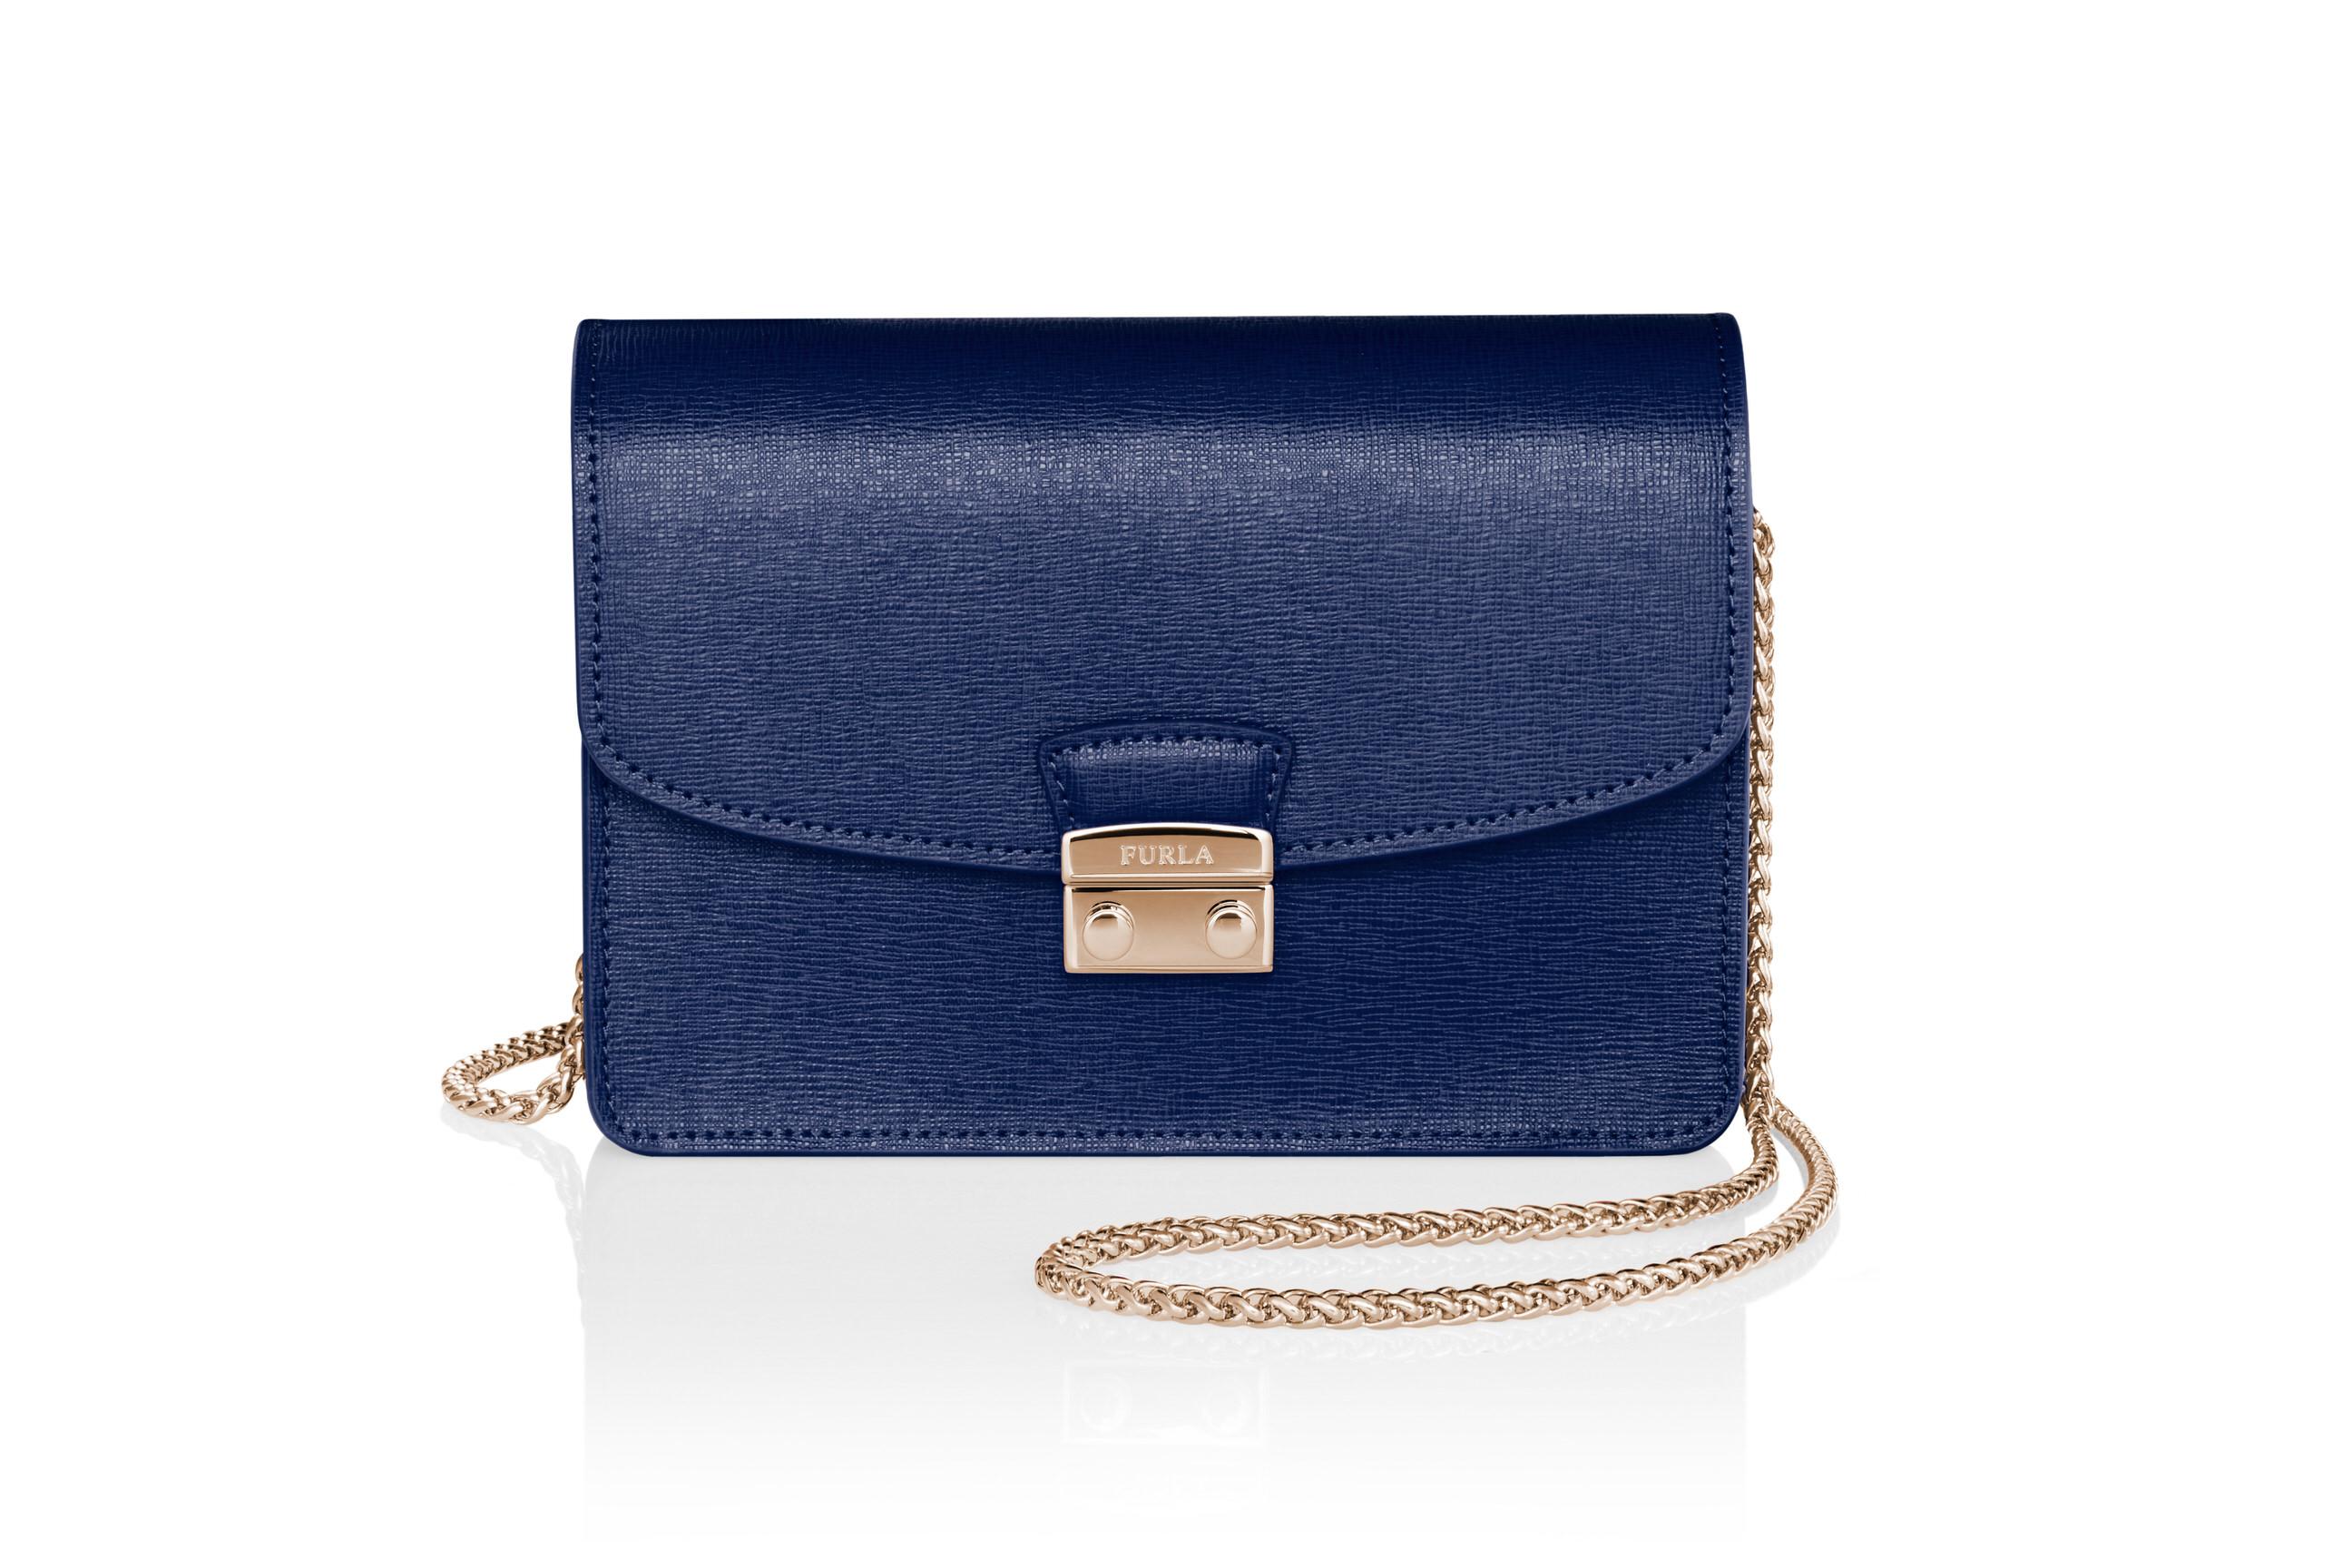 SKYlink_Furla_Giulia_Packshot_sRGBB-blau